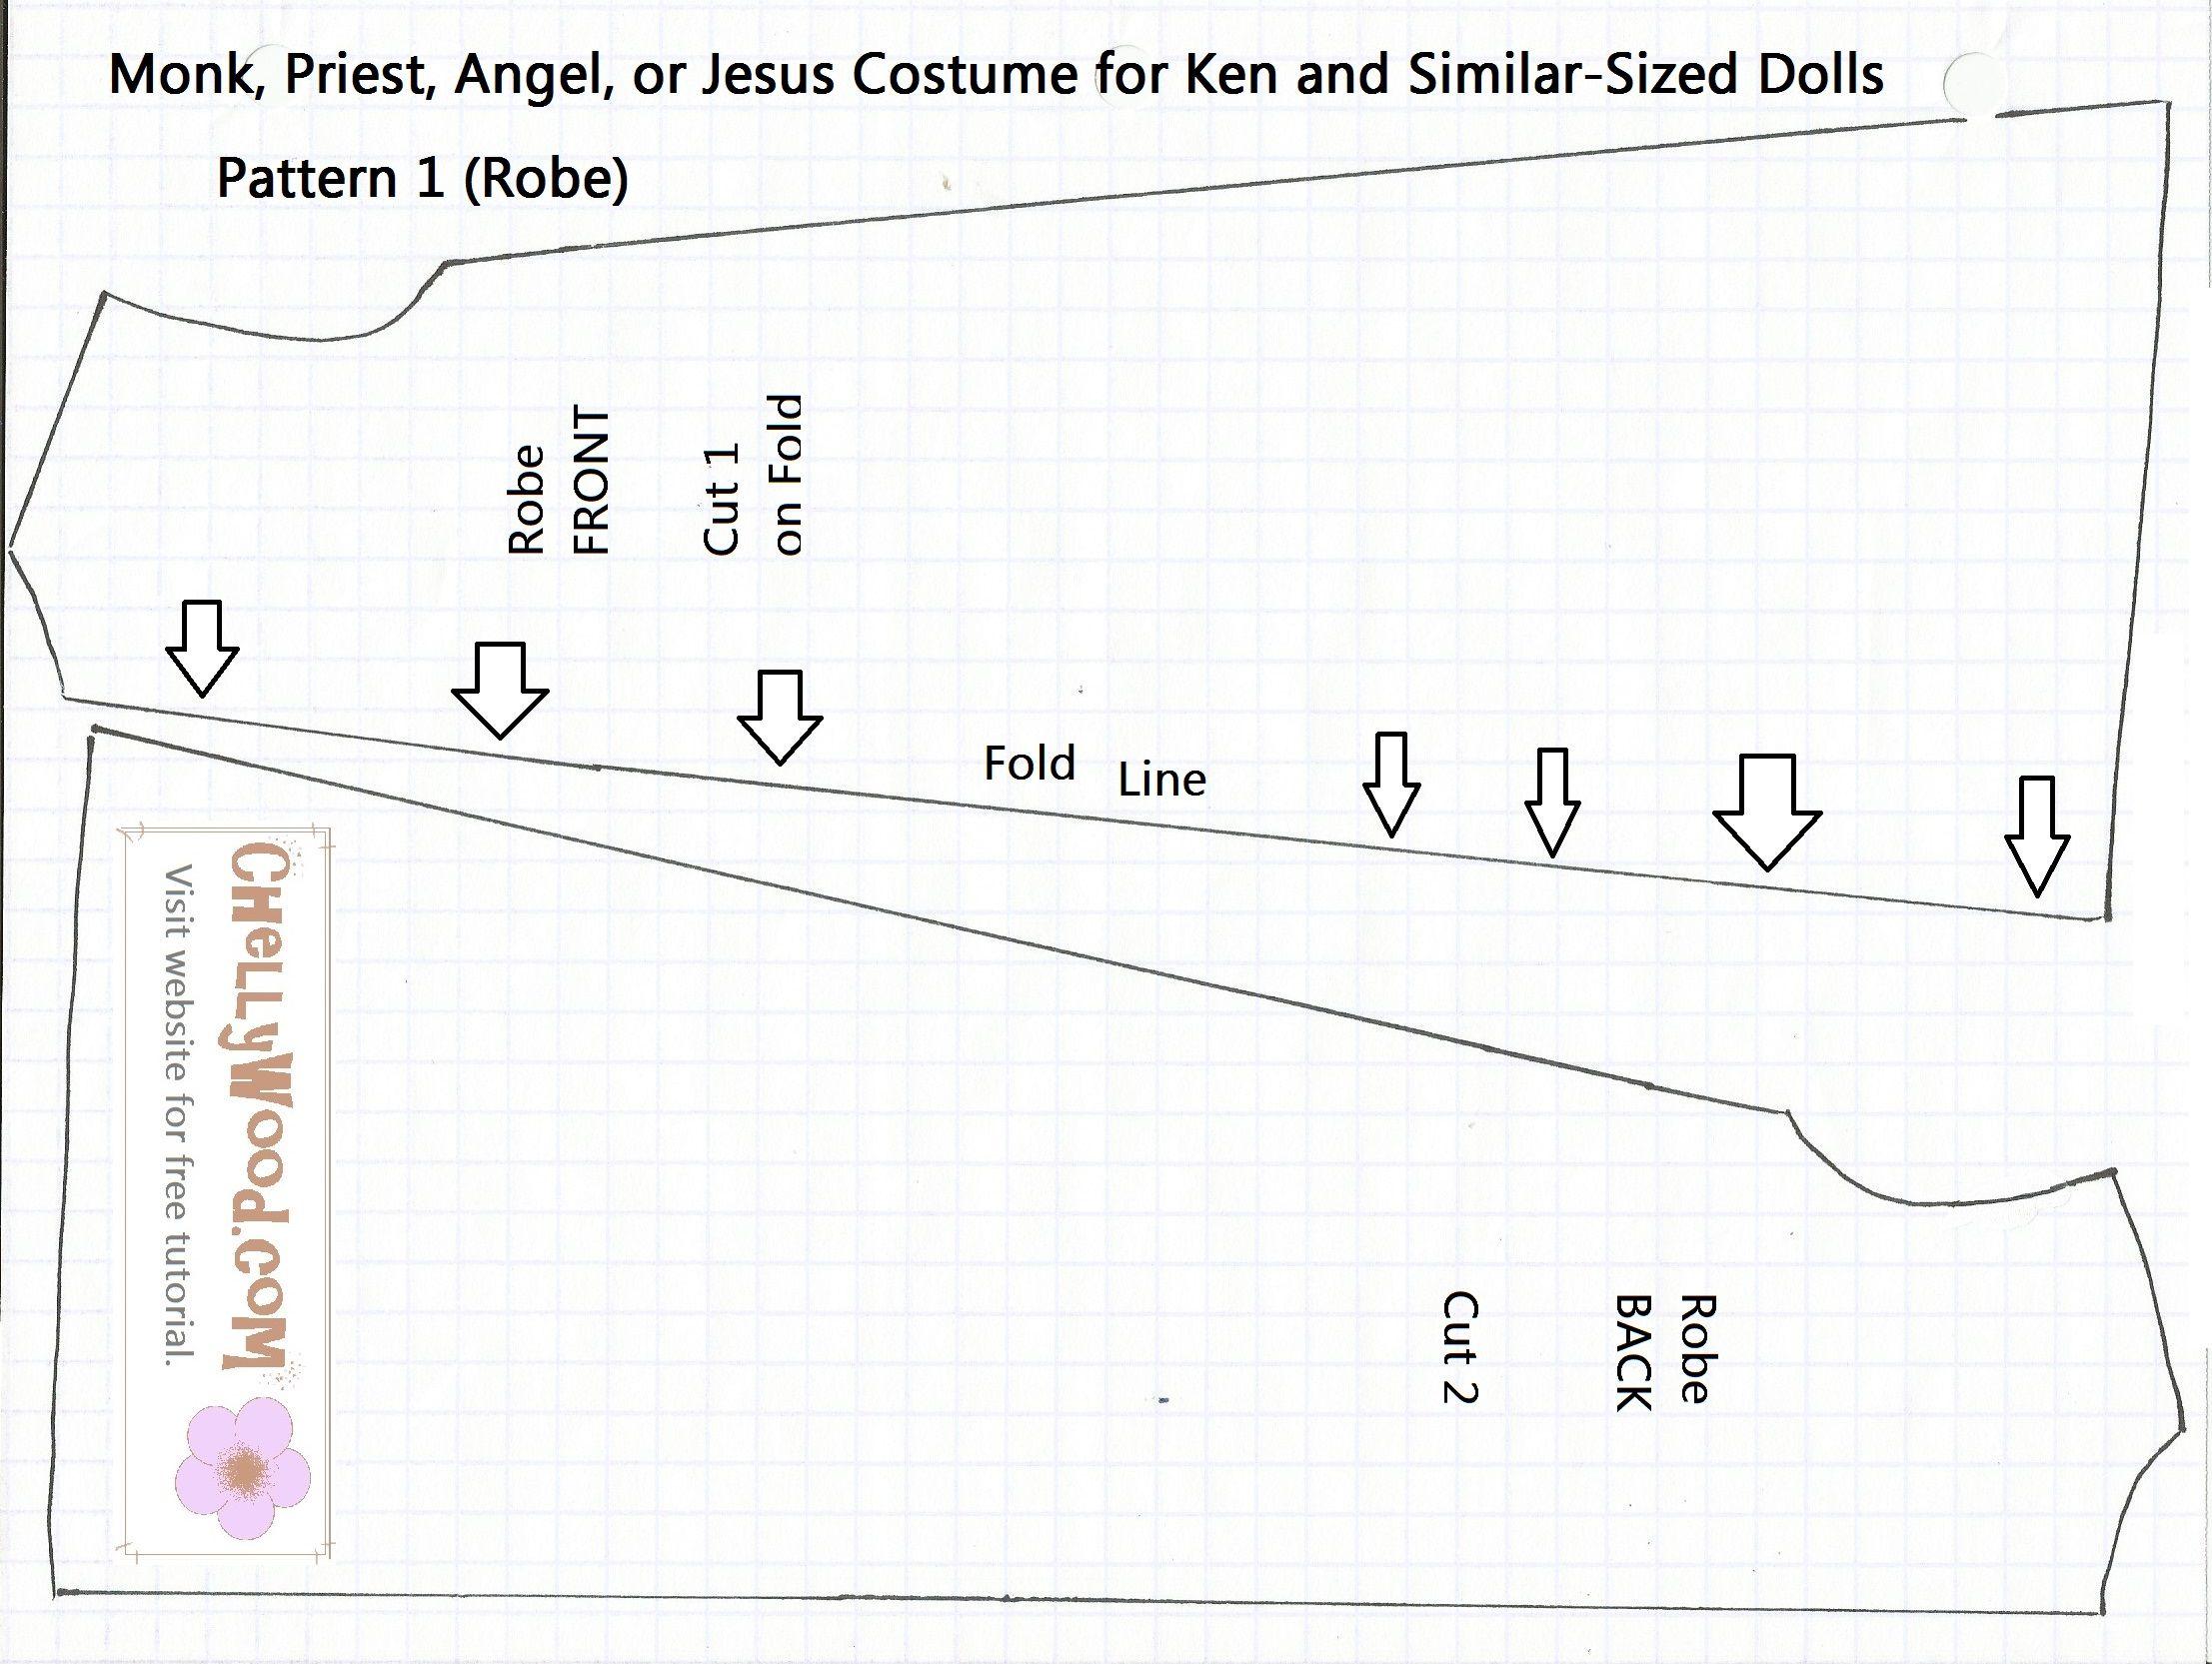 Catholic Priest Costume Doll Pattern Fits Ken Dolls This